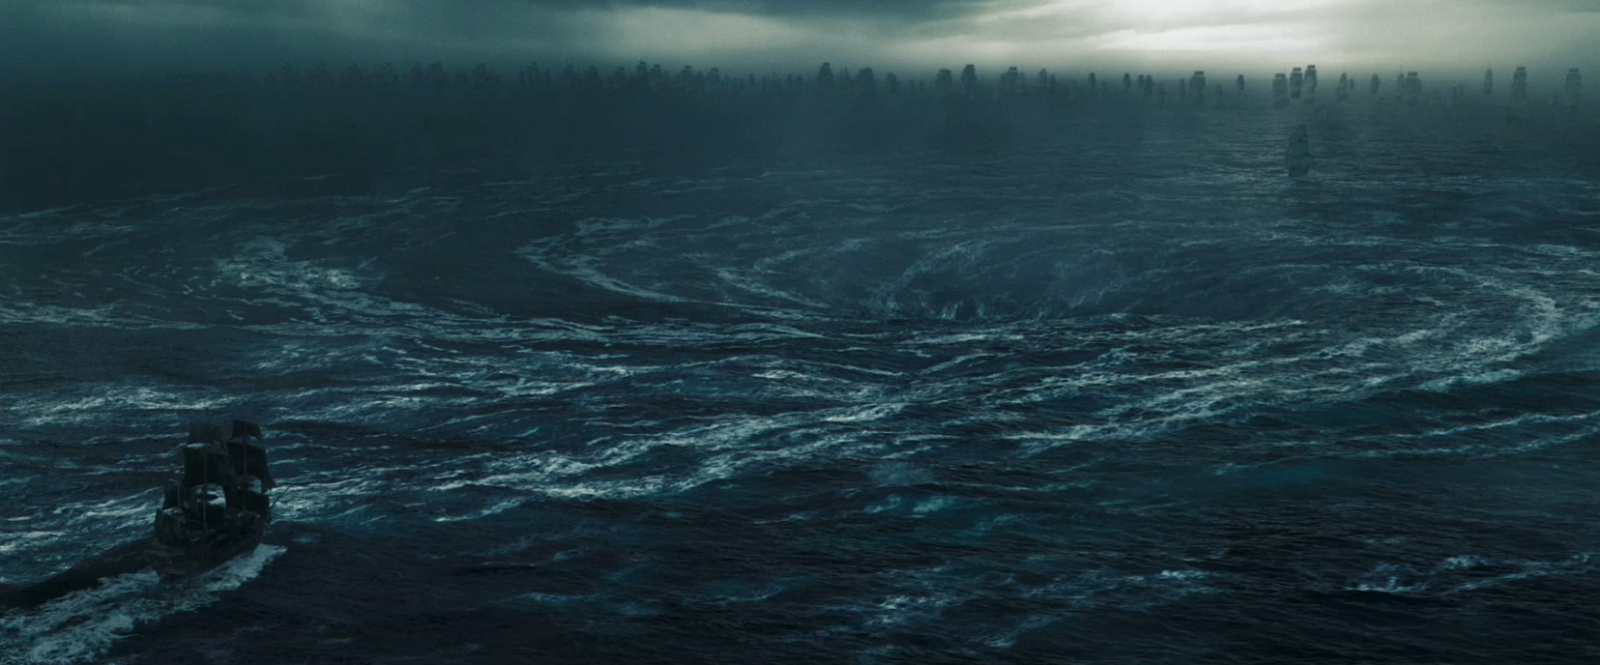 Ocean Maelstrom Detailed Swirling Mael...